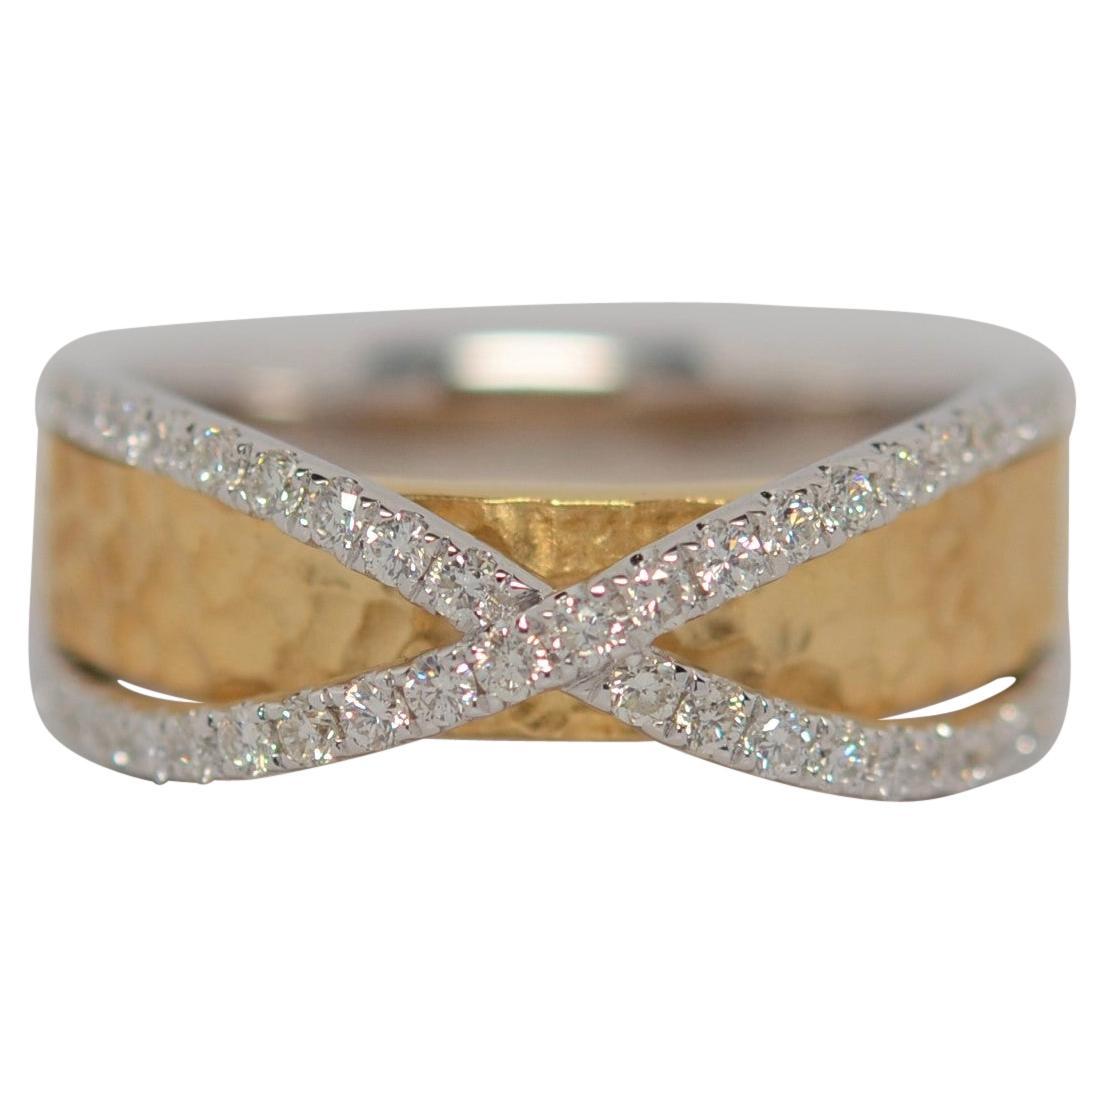 18K Two Tone Gold & Round Brilliant Cut Diamond Ring, 0.50 Carats